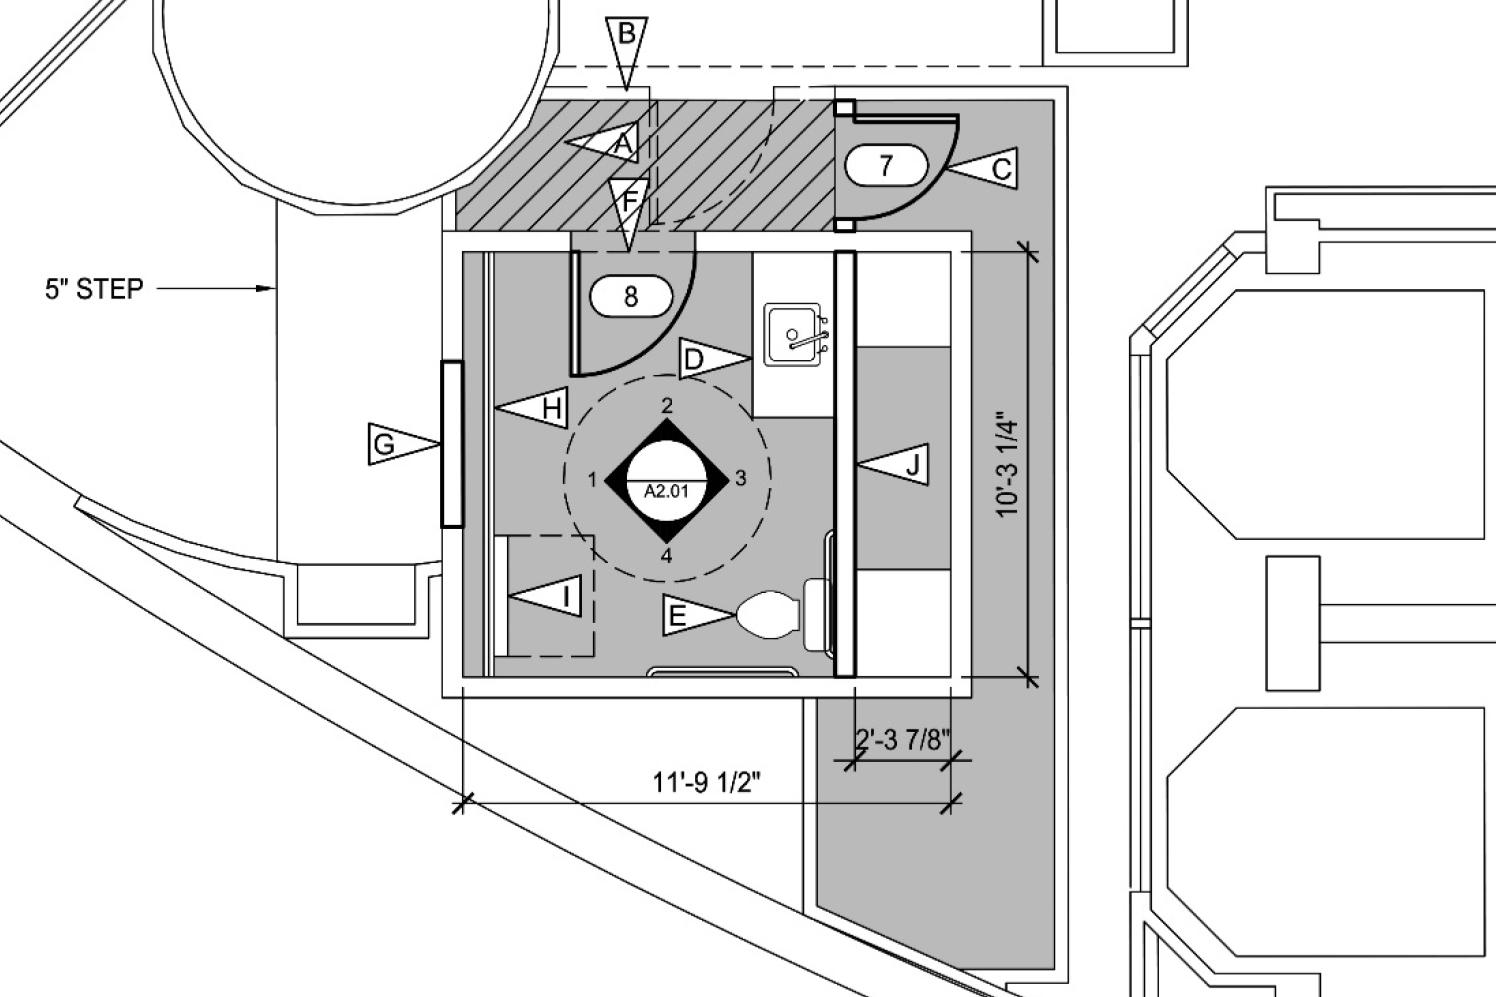 Seattle Municipal Tower Gender Neutral Restrooms